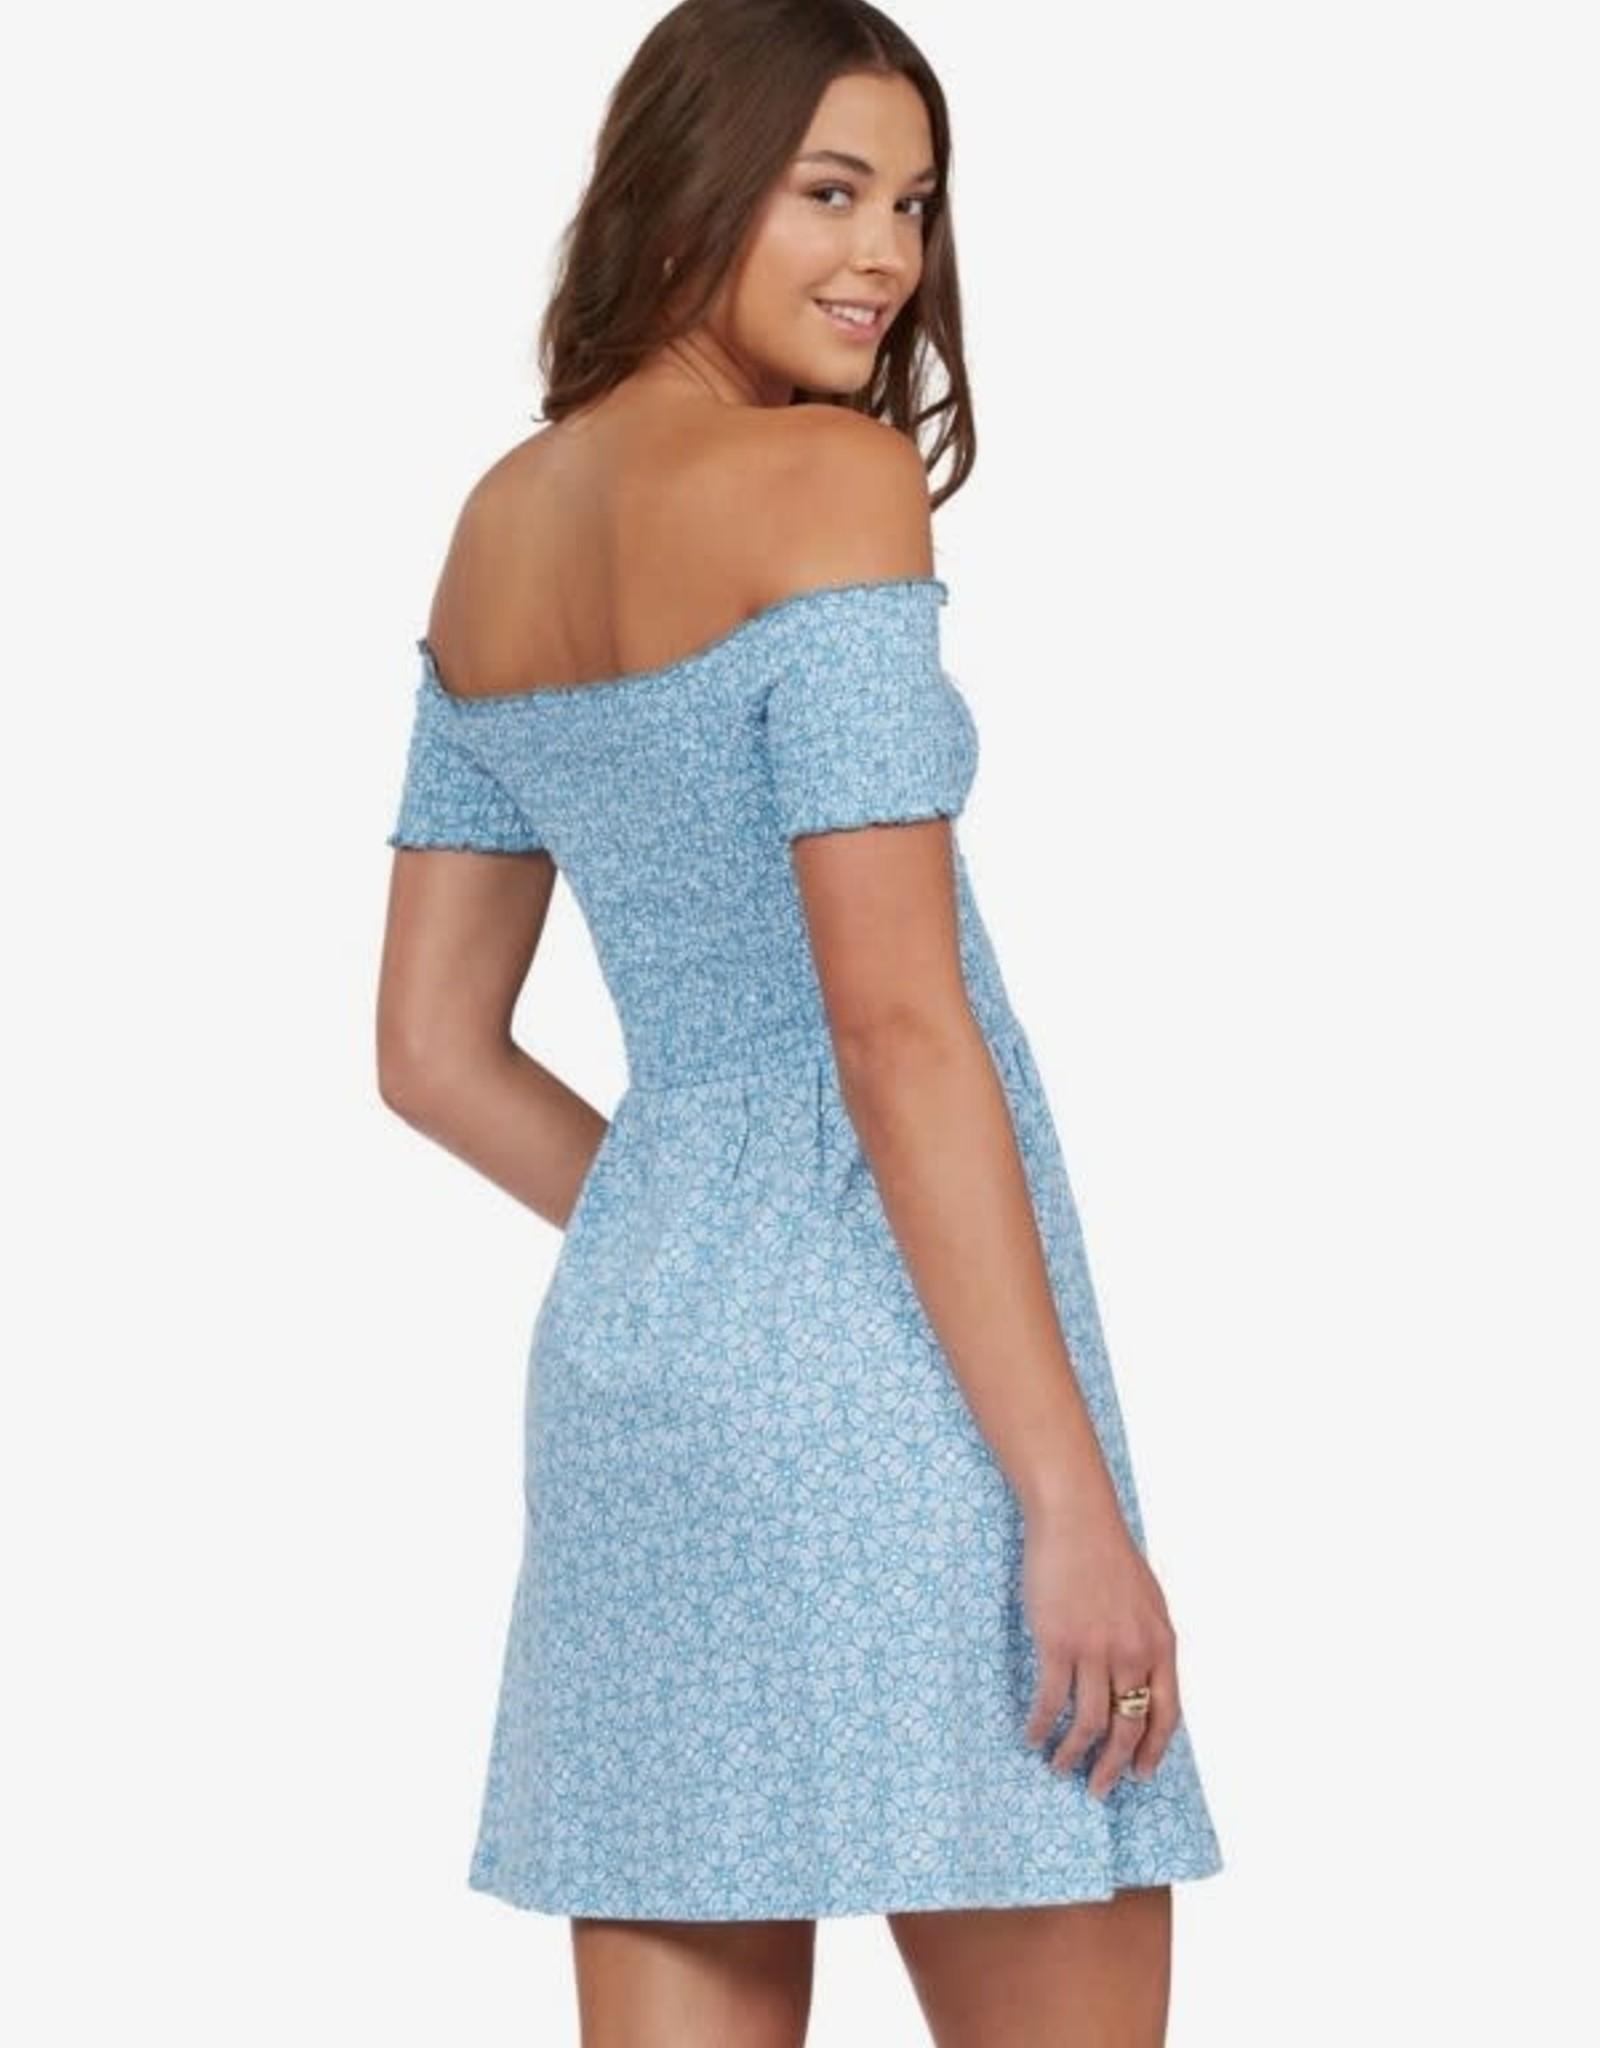 ROXY US TOGETHER DRESS BLUE